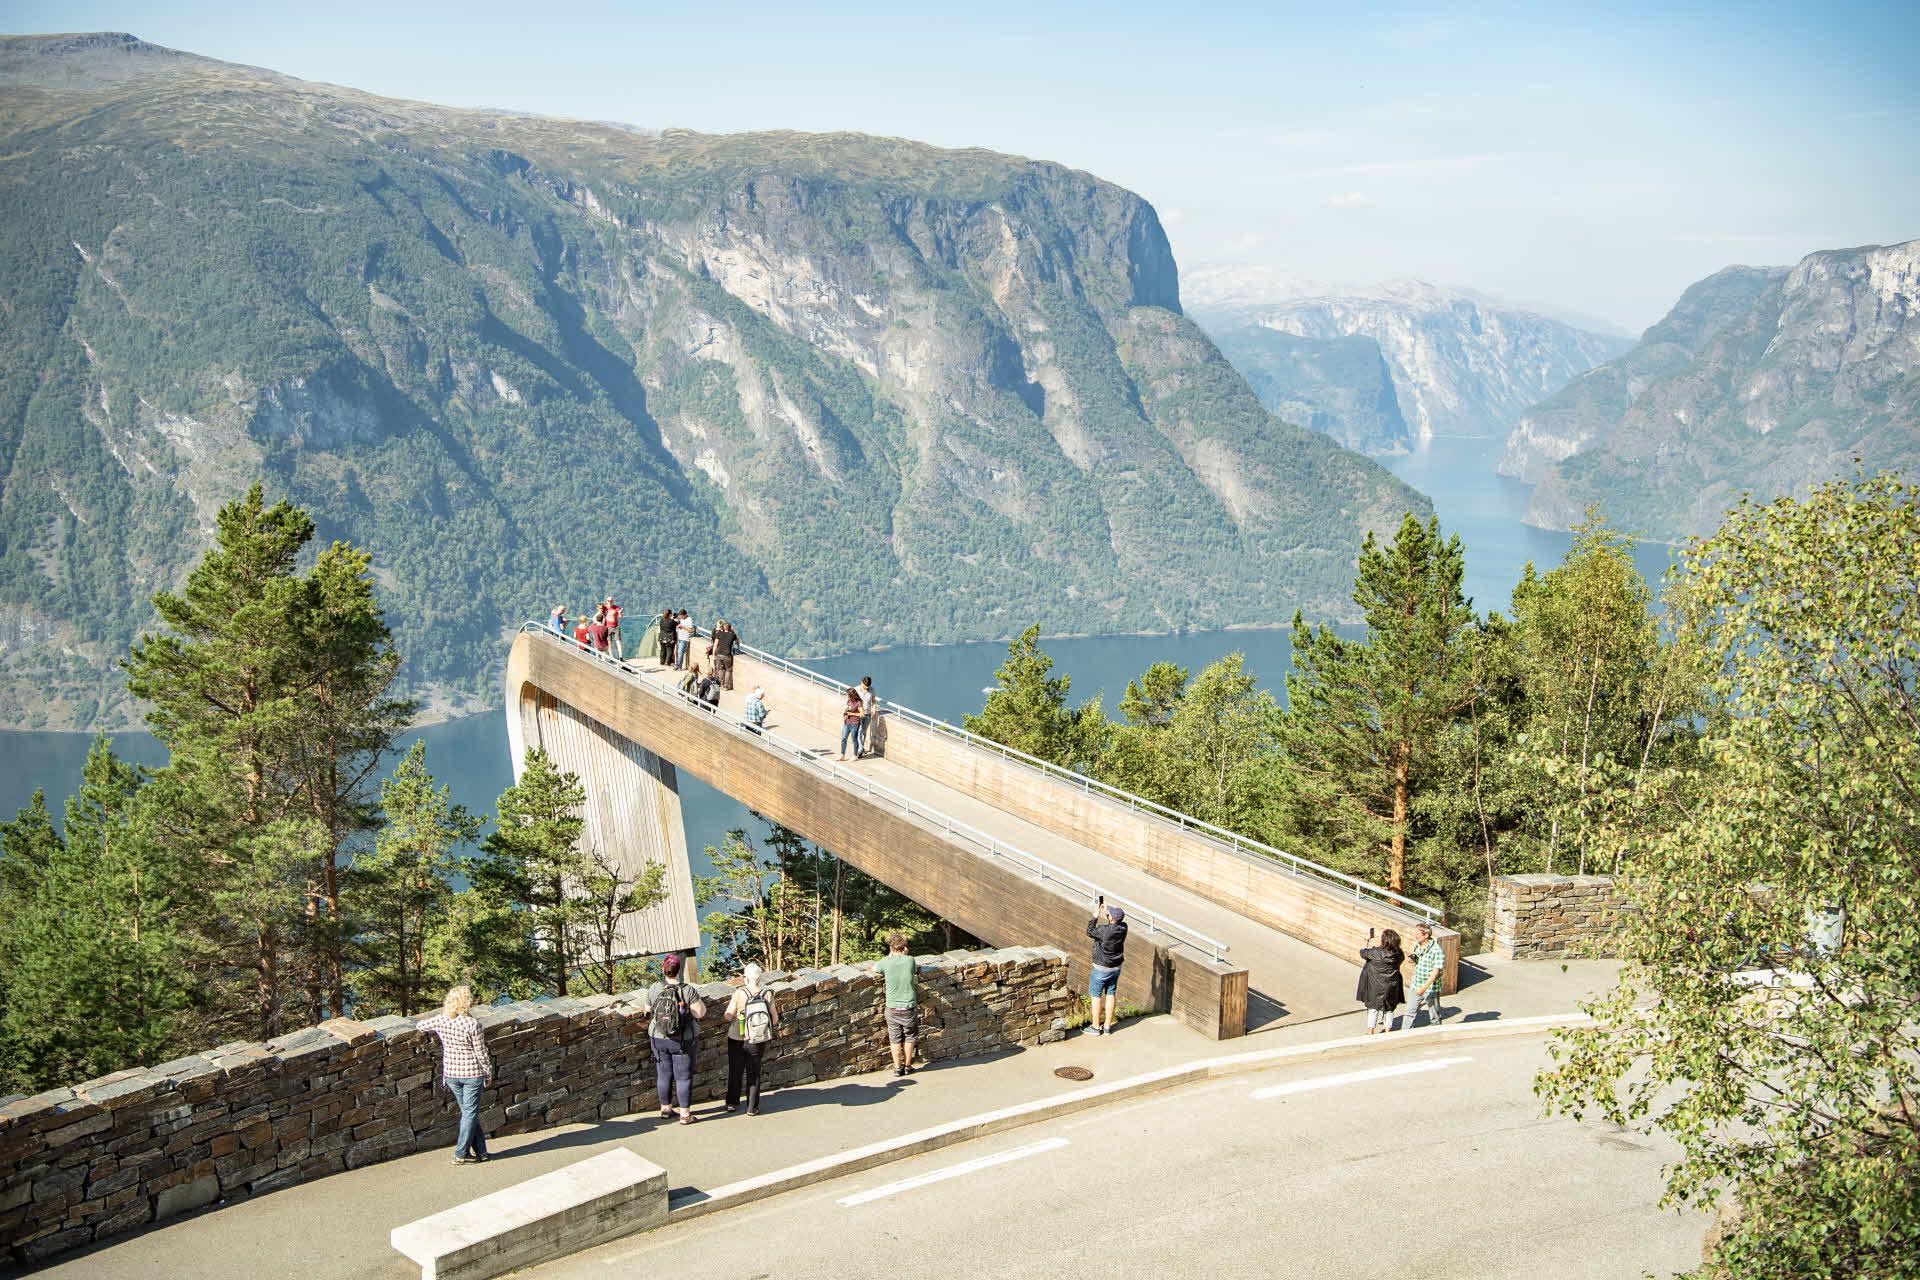 Folk ser på utsikta over Aurlandsfjorden frå Stegastein utsiktspunkt